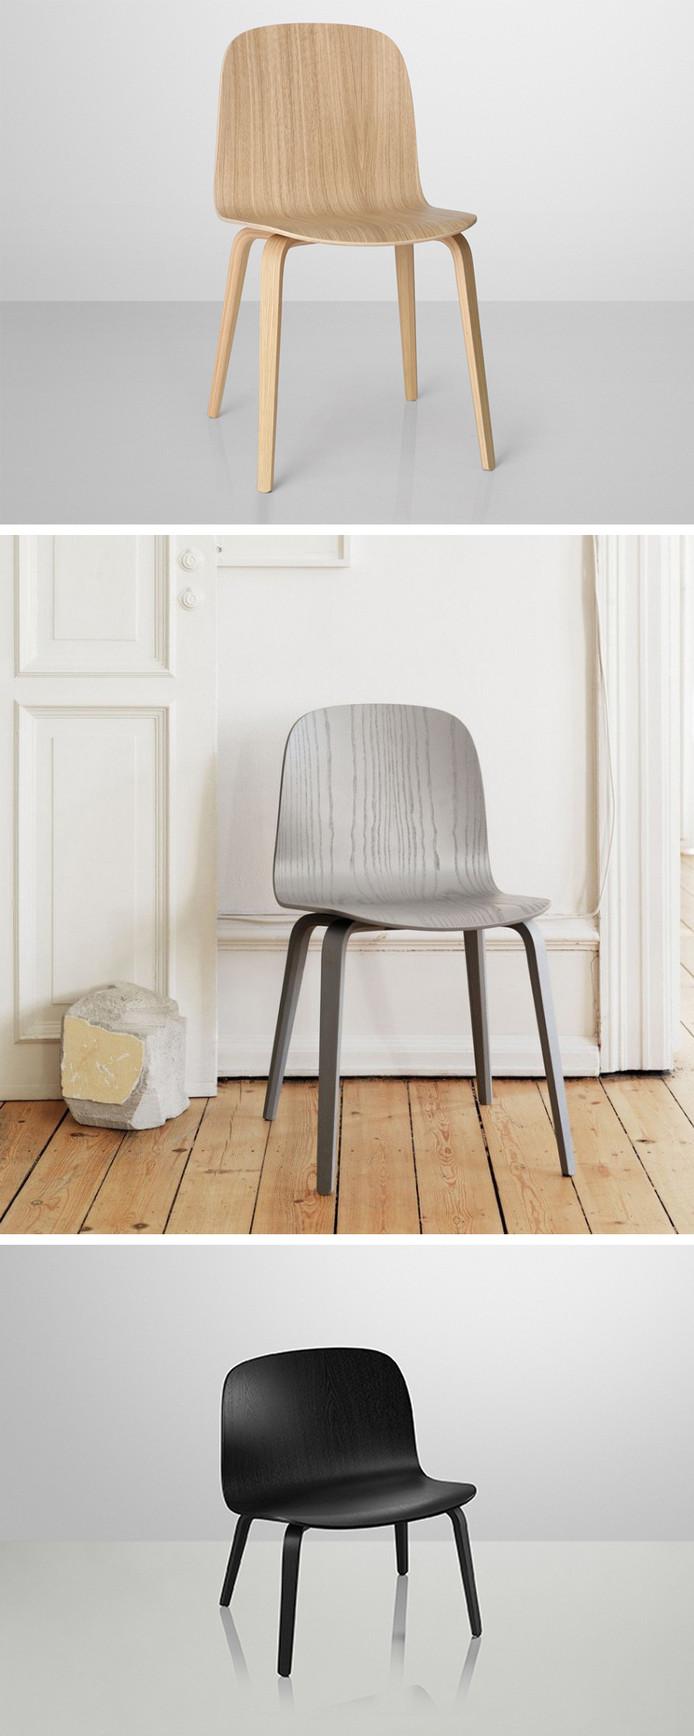 Chairs Collection I Visu Chair